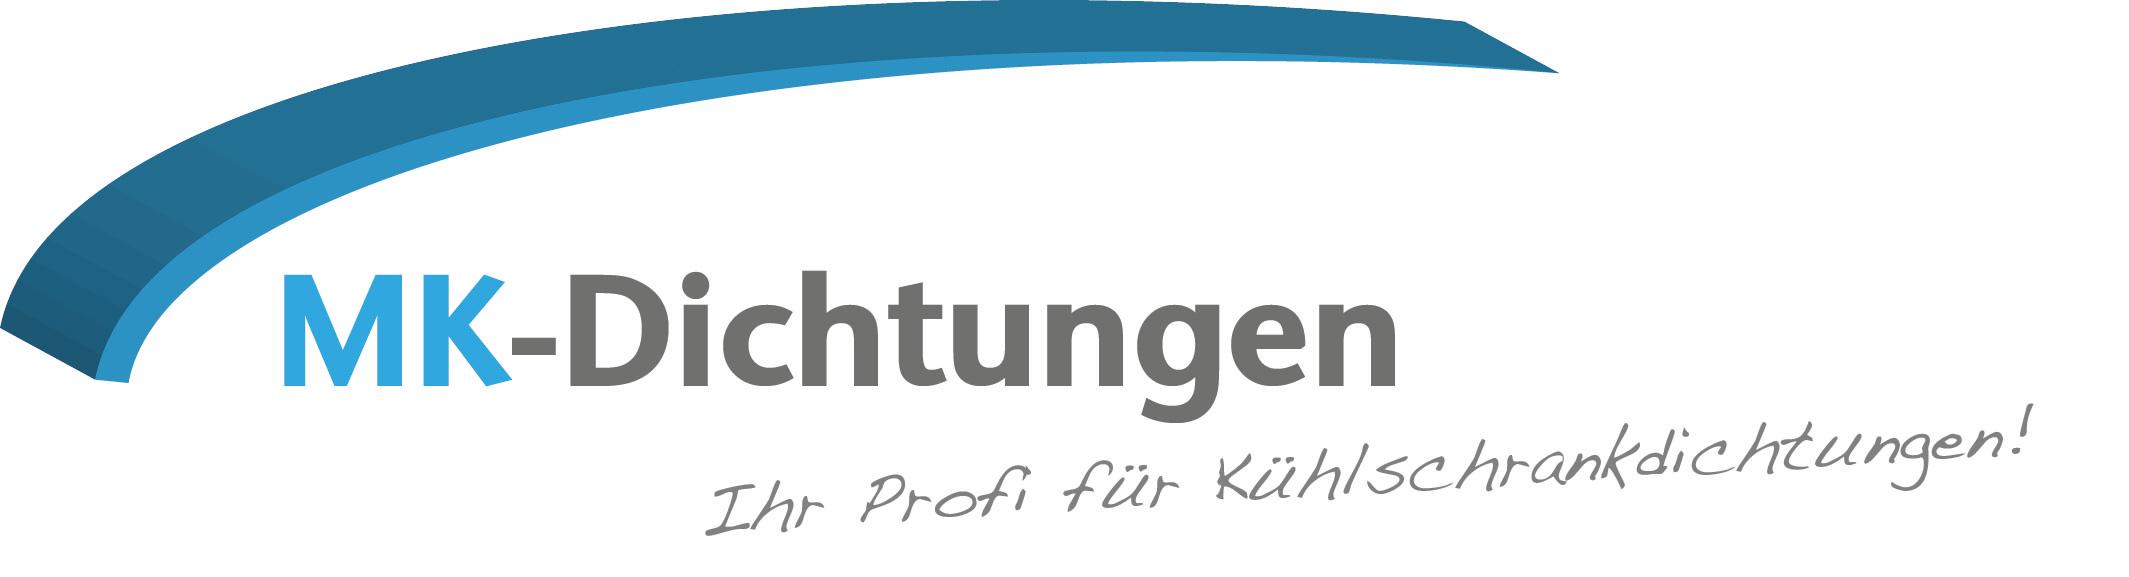 gastro-dichtung.de-Logo